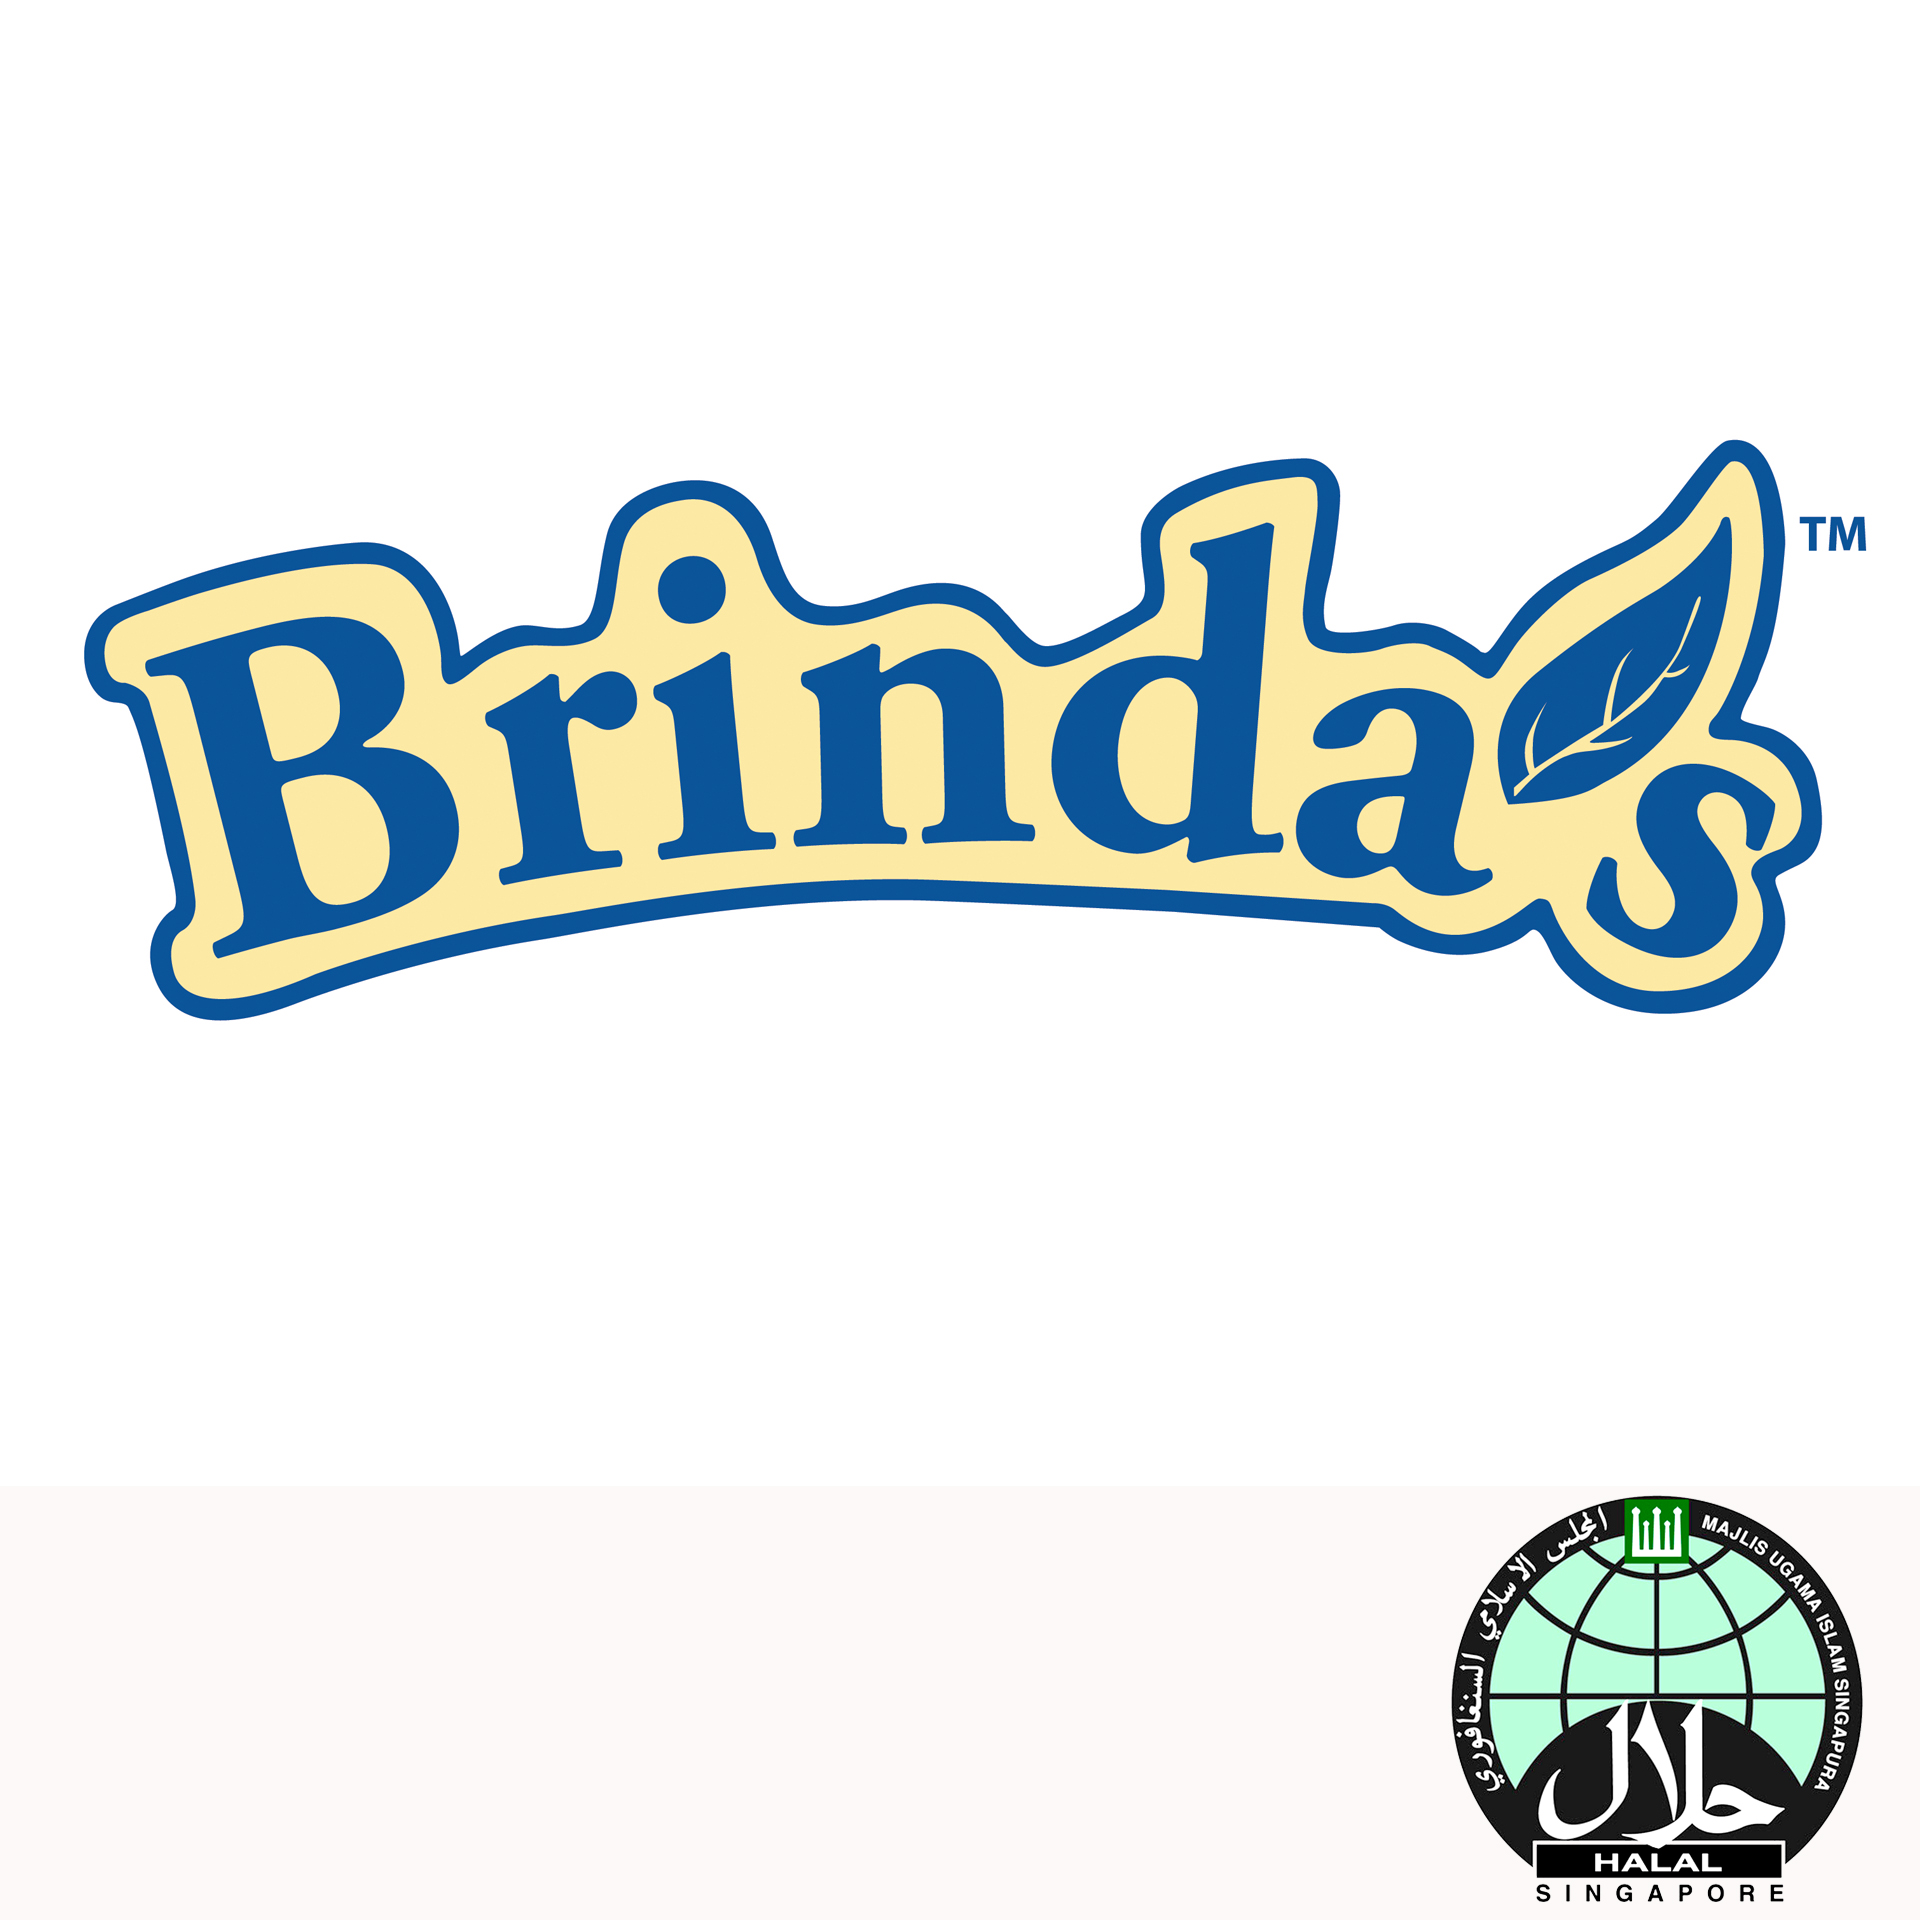 Brinda's image